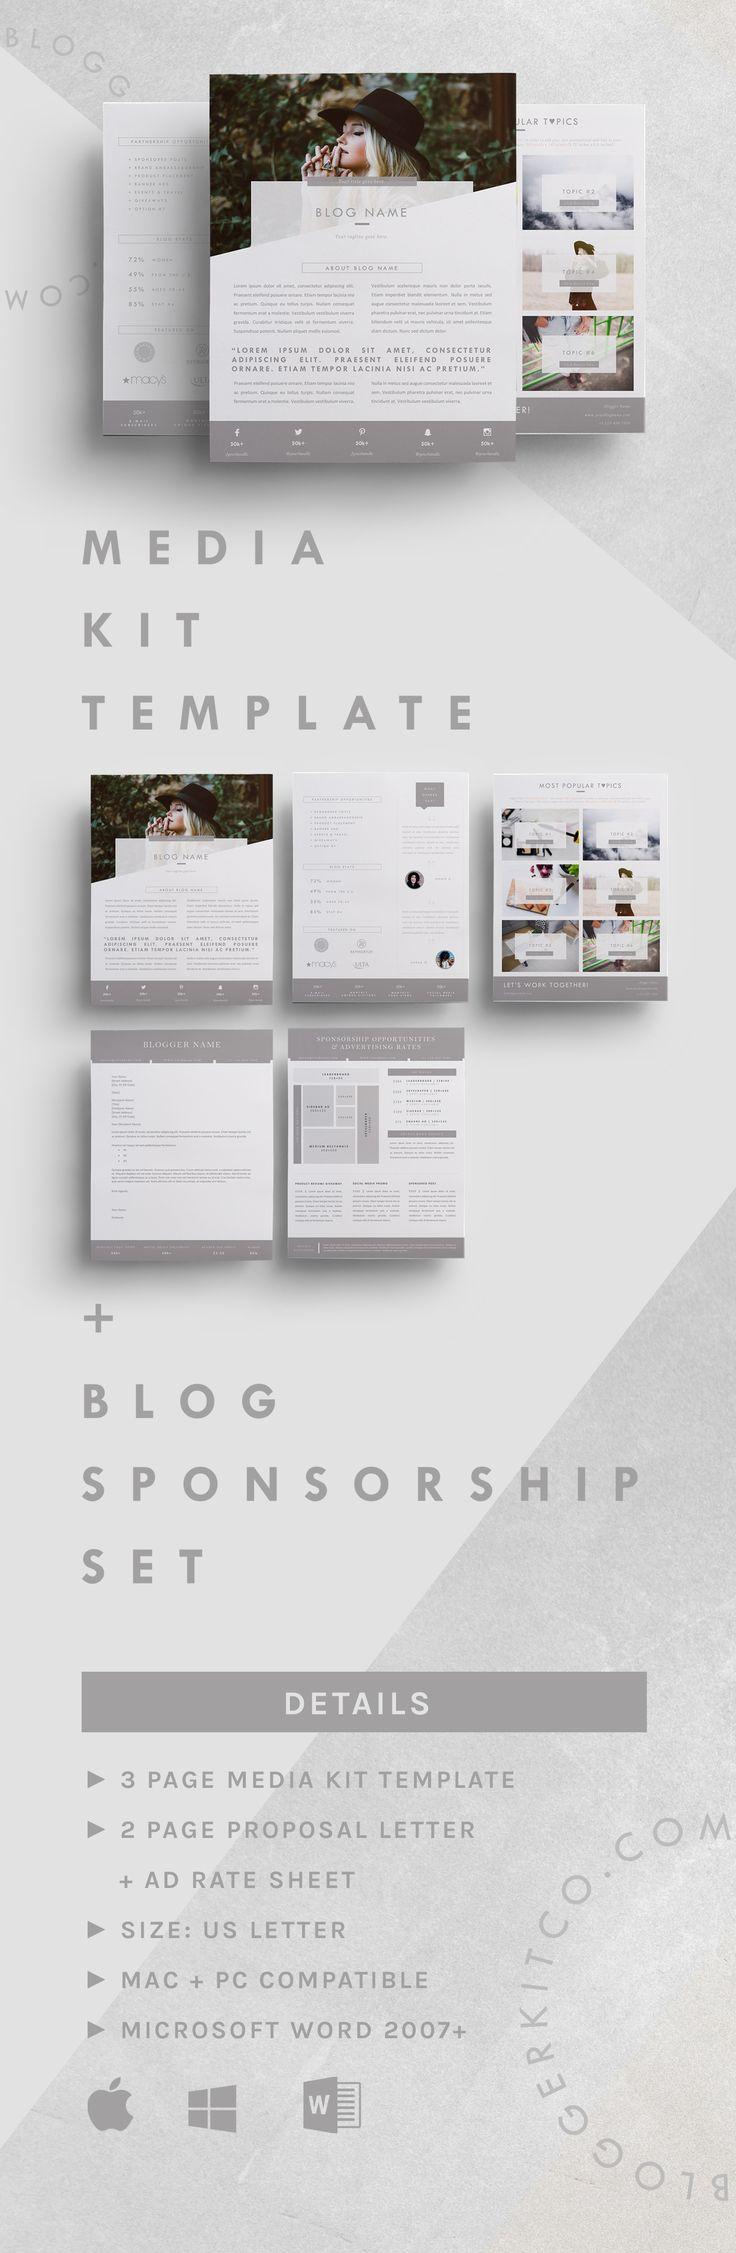 5 Page Media Kit Template and Blog Sponsorship Set